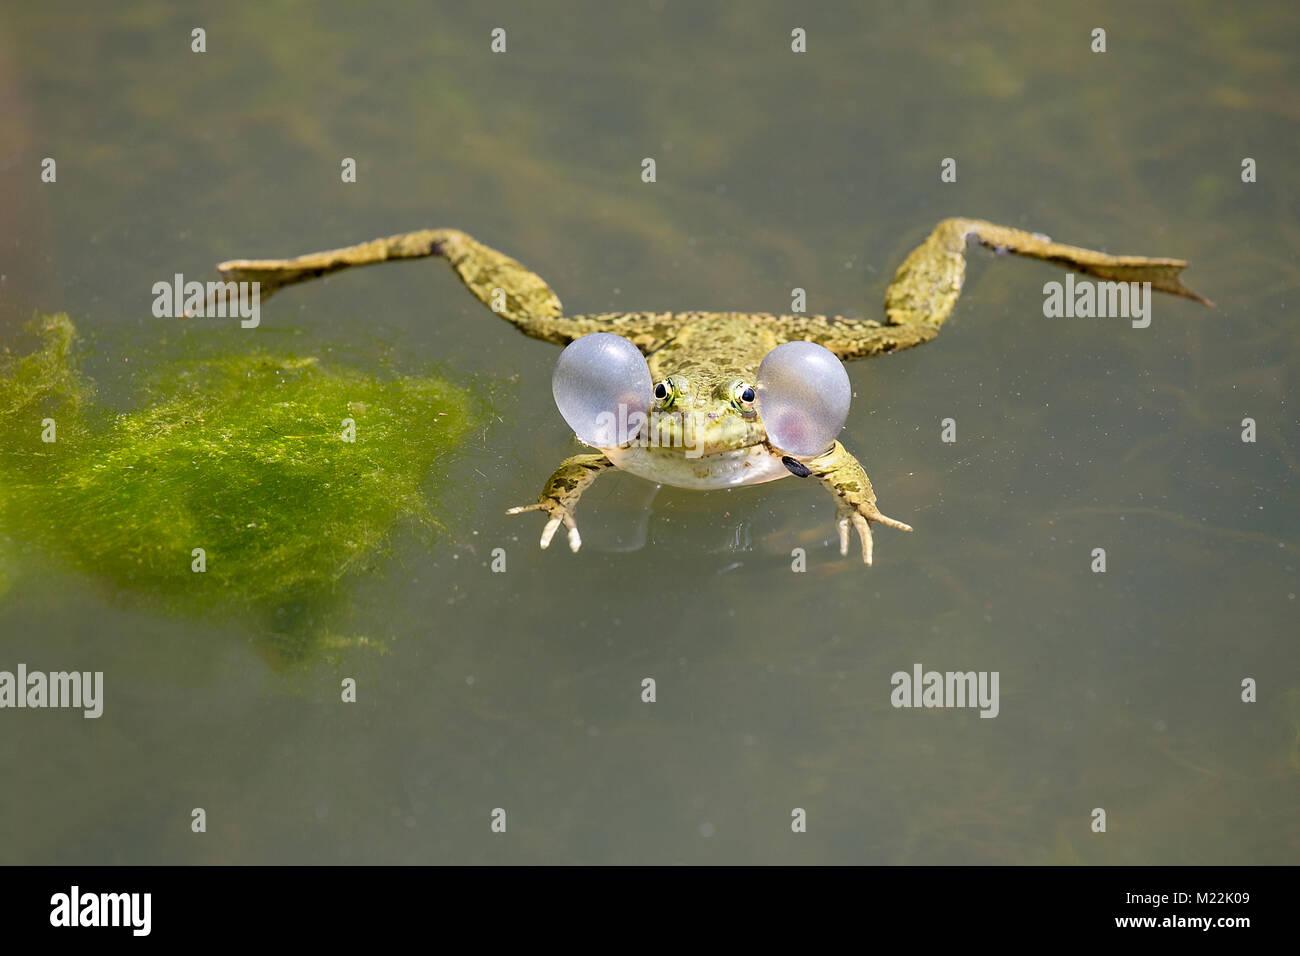 Croaking Green frog (Rana dalmatina) with balloons while croaking in water - Stock Image